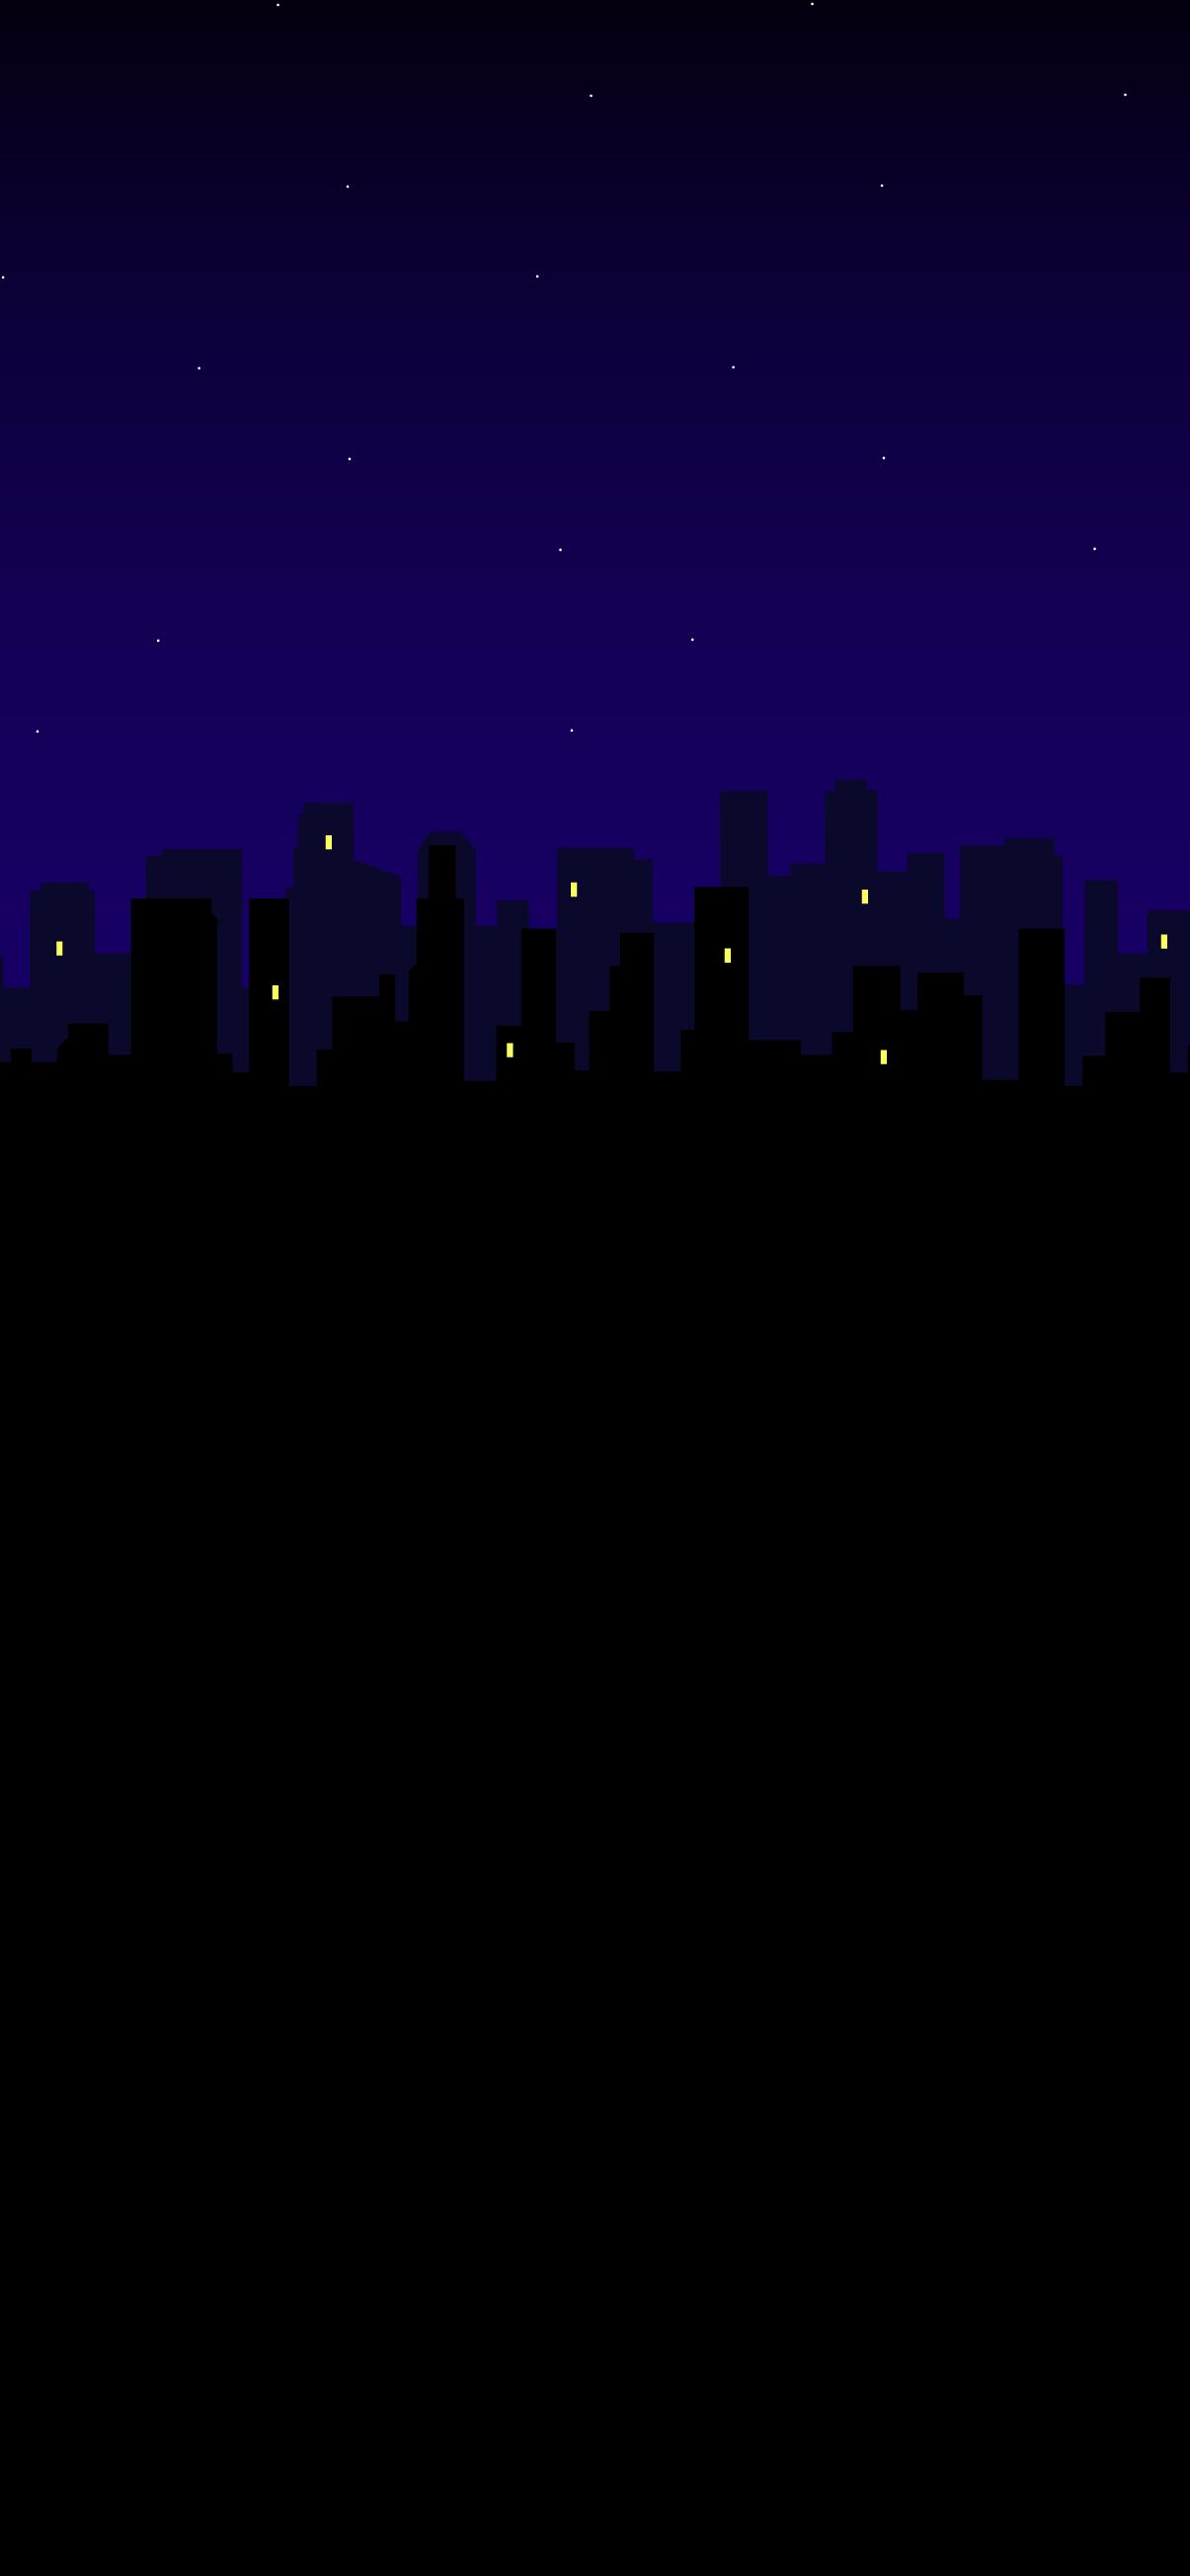 black amoled wallpaper city silhouette in 4k